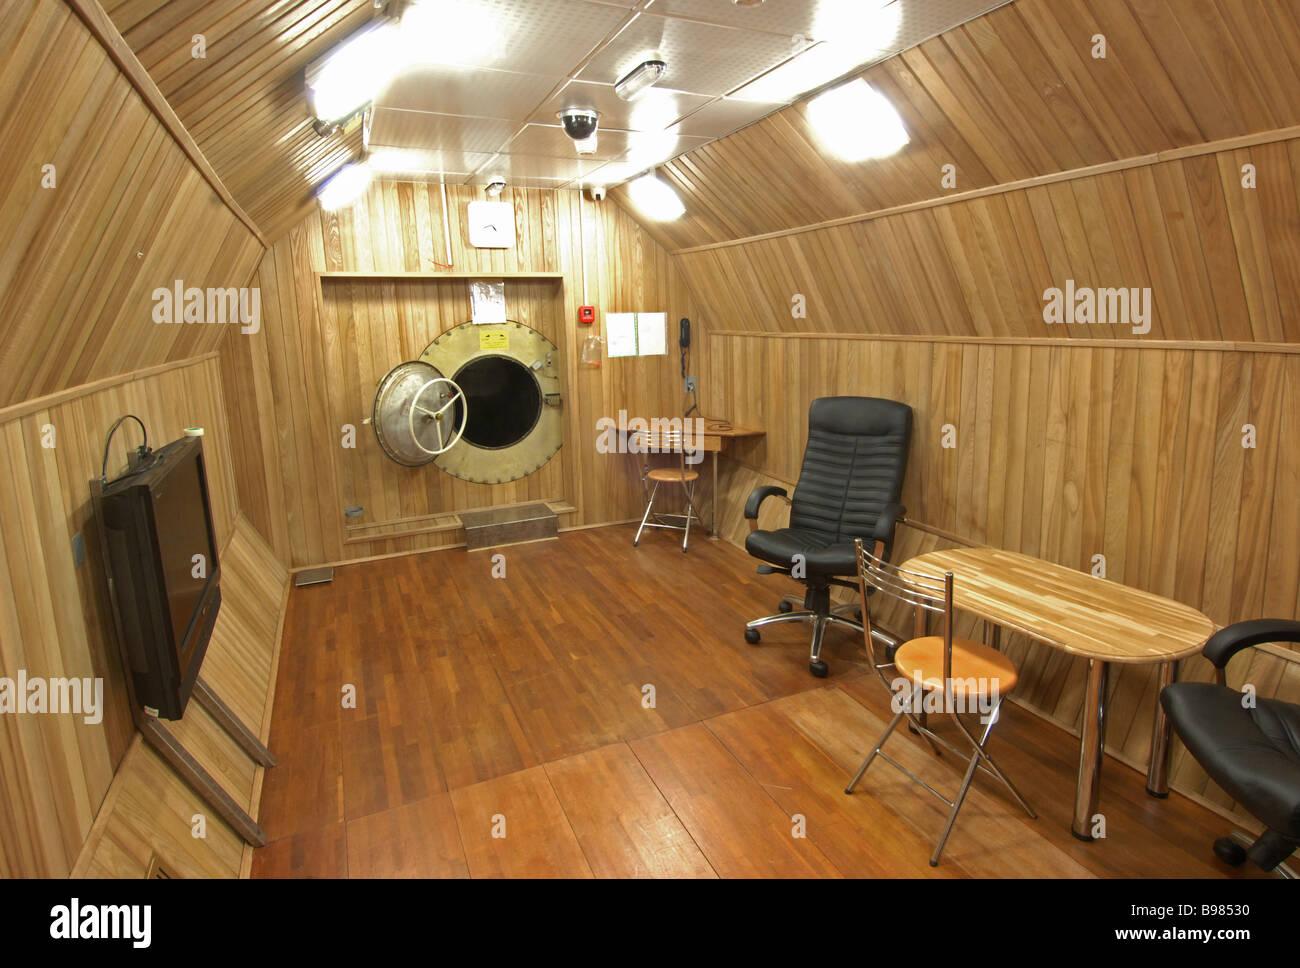 Community room Martian spaceship simulator - Stock Image